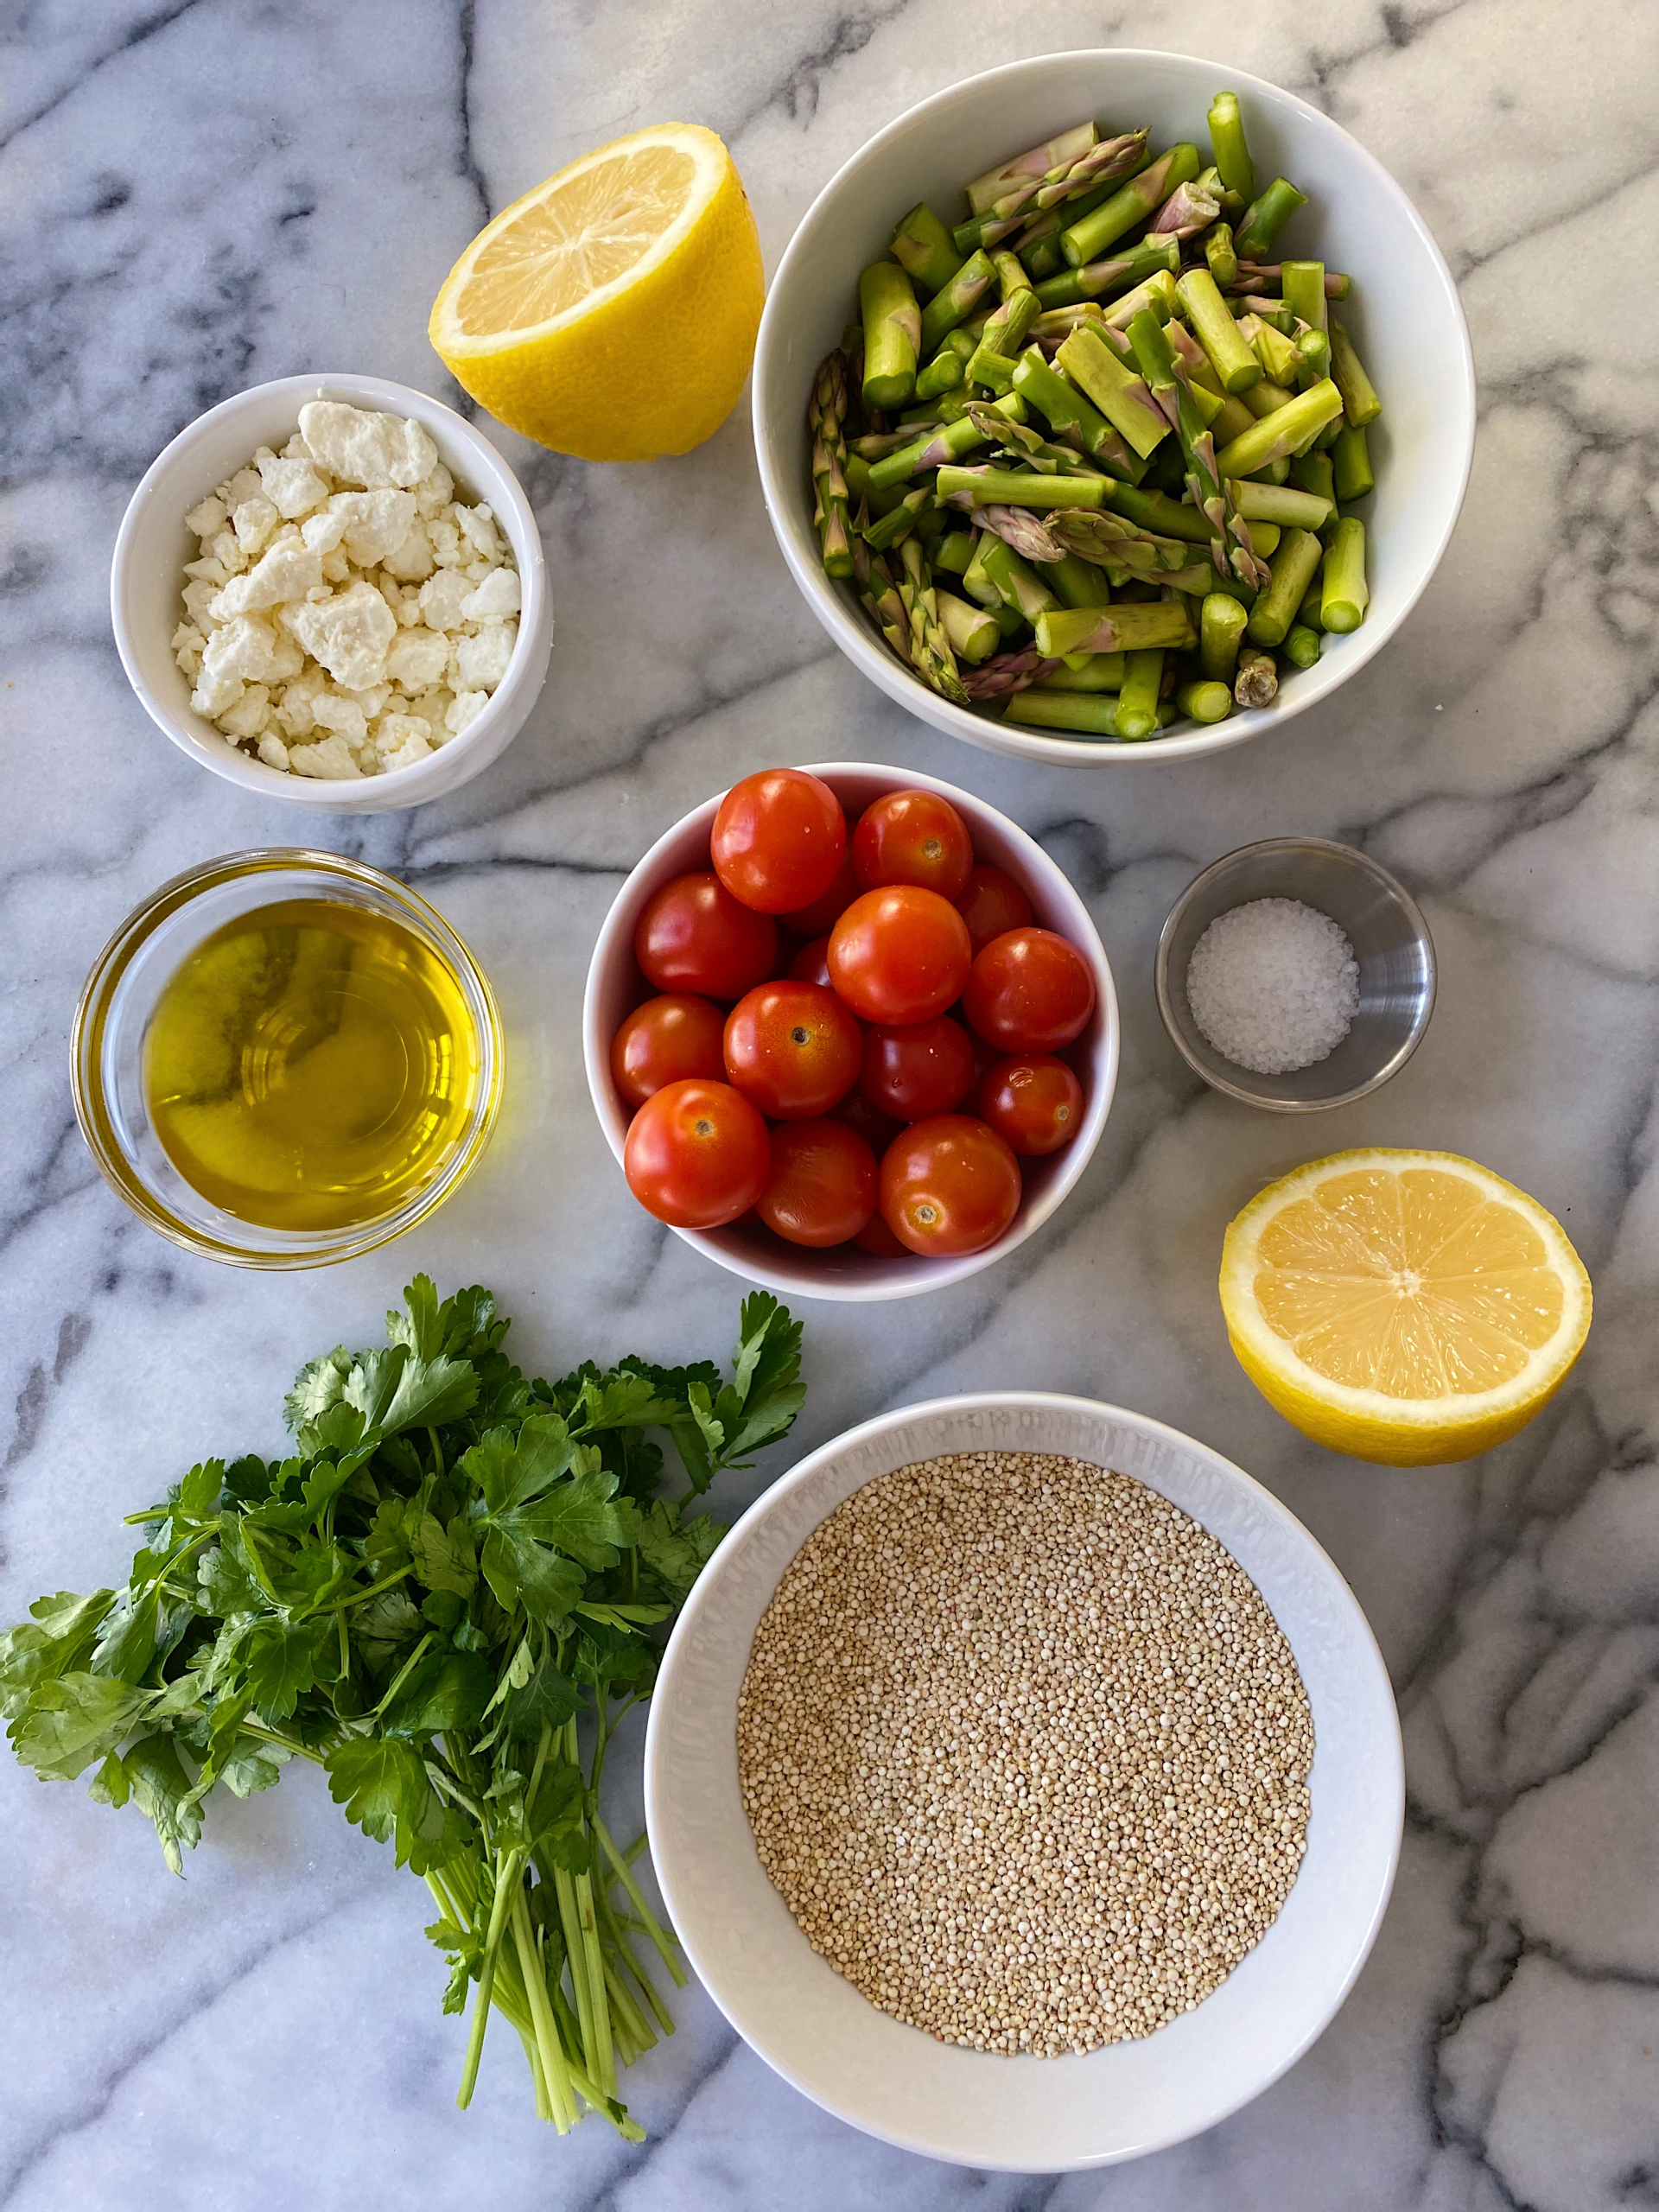 Spring Quinoa Salad Asparaugs Tomatoes Easy Recipe gluten free #glutenfreerecipes www.healthygffamily.com